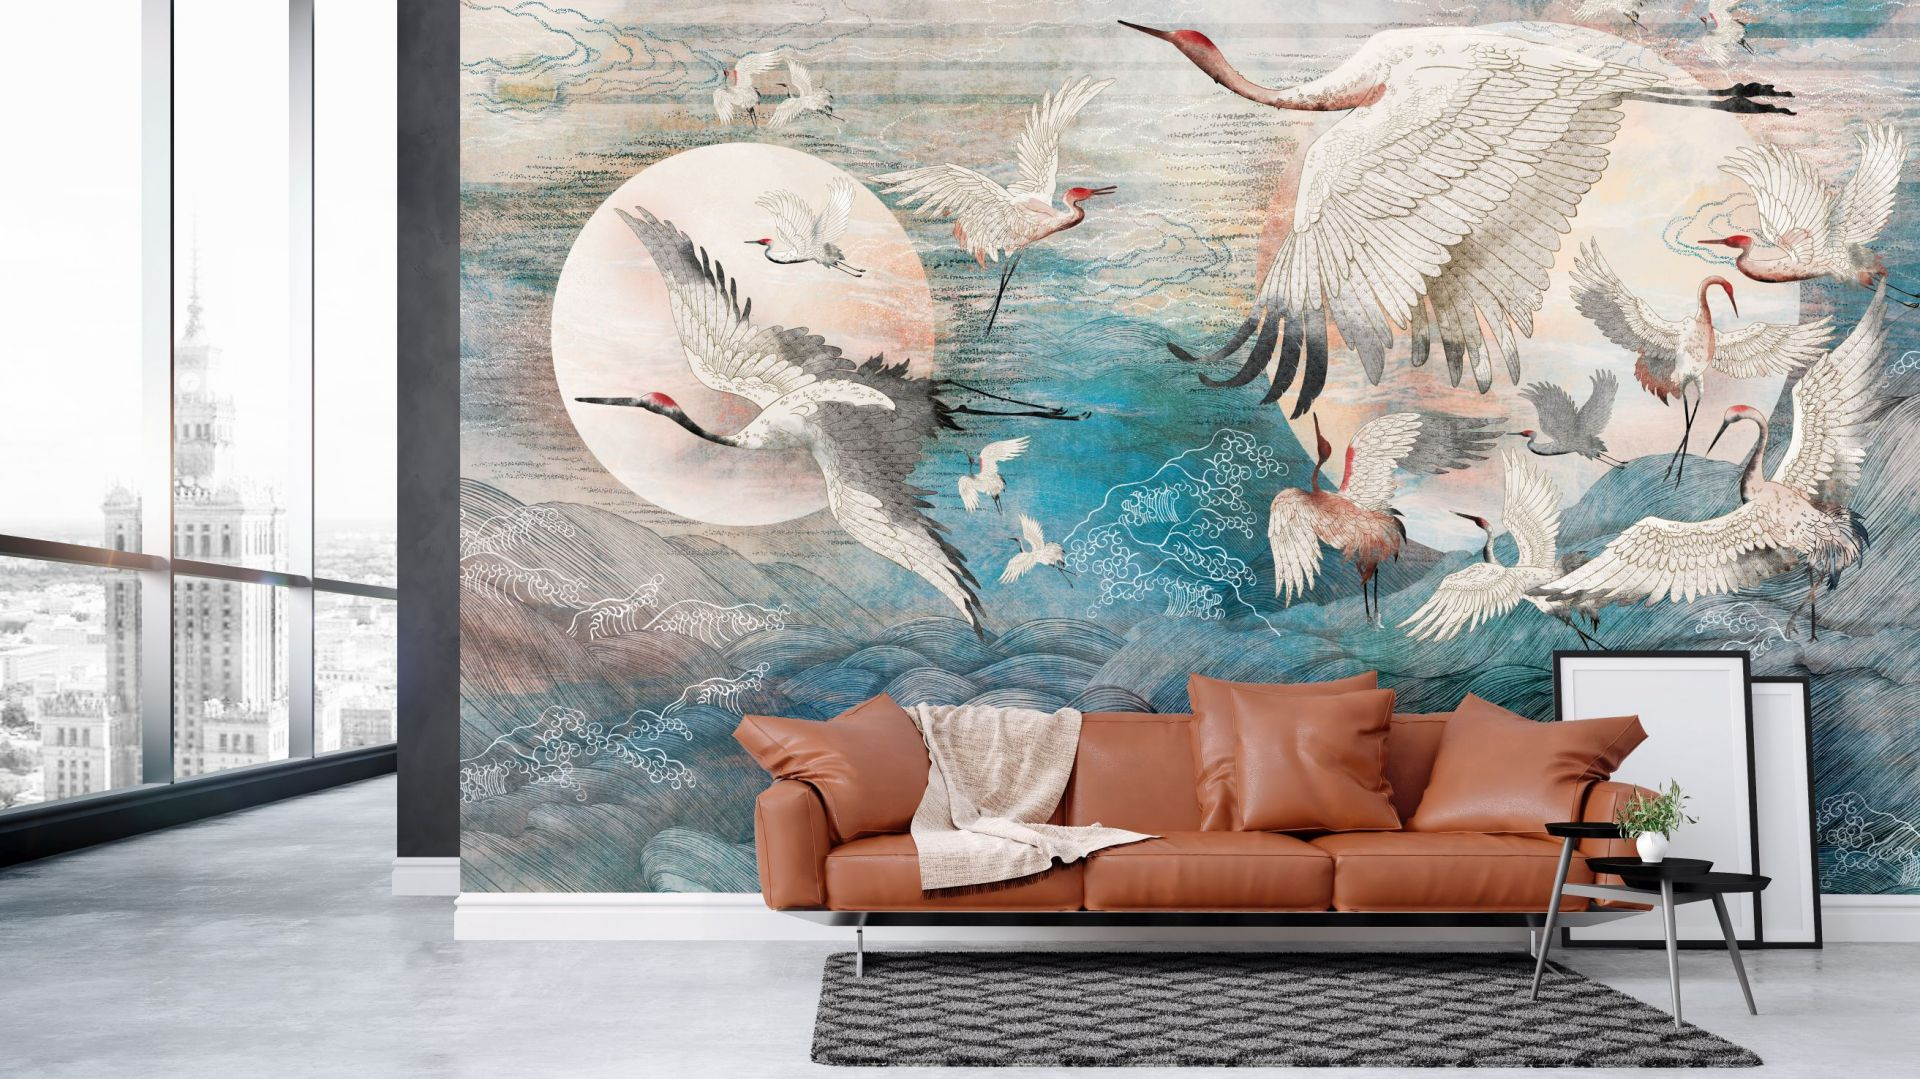 Tapeta z kolekcji Dance of Cranes. Cena: 160 zł/m2. Fot. Walltime